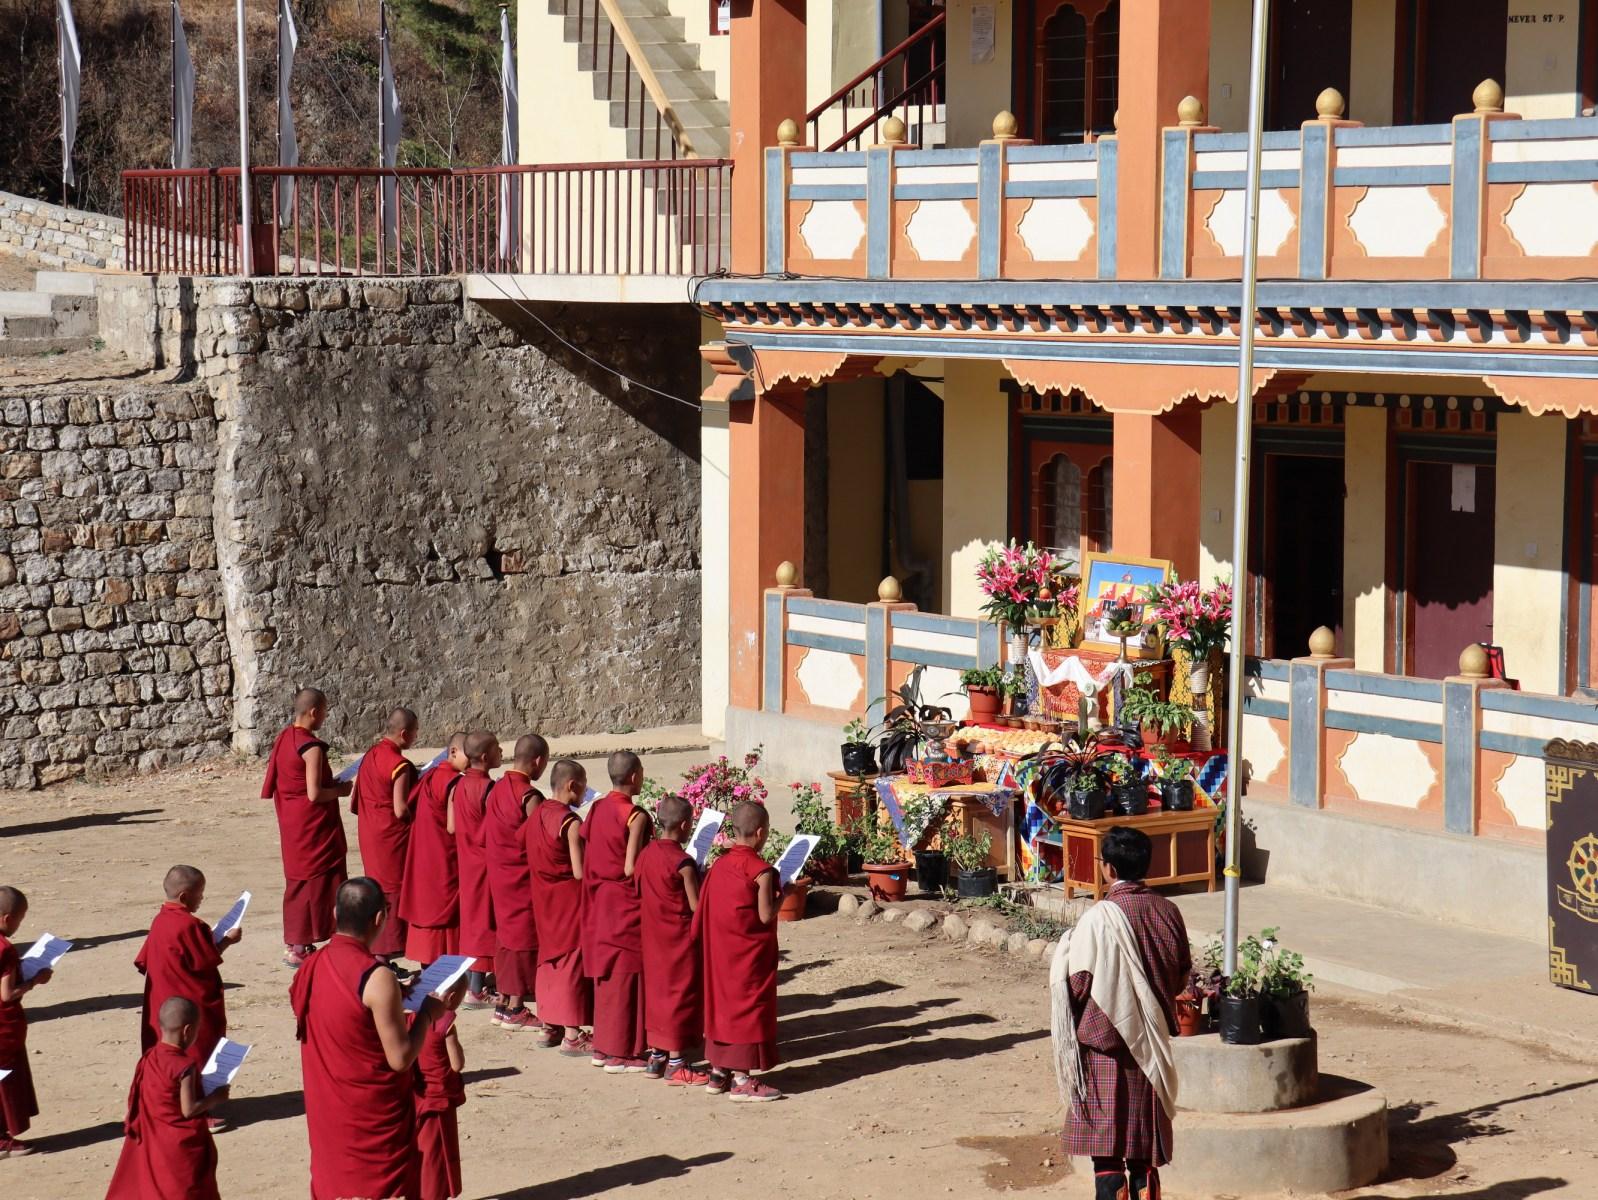 113-National-day-of-Bhutan-31